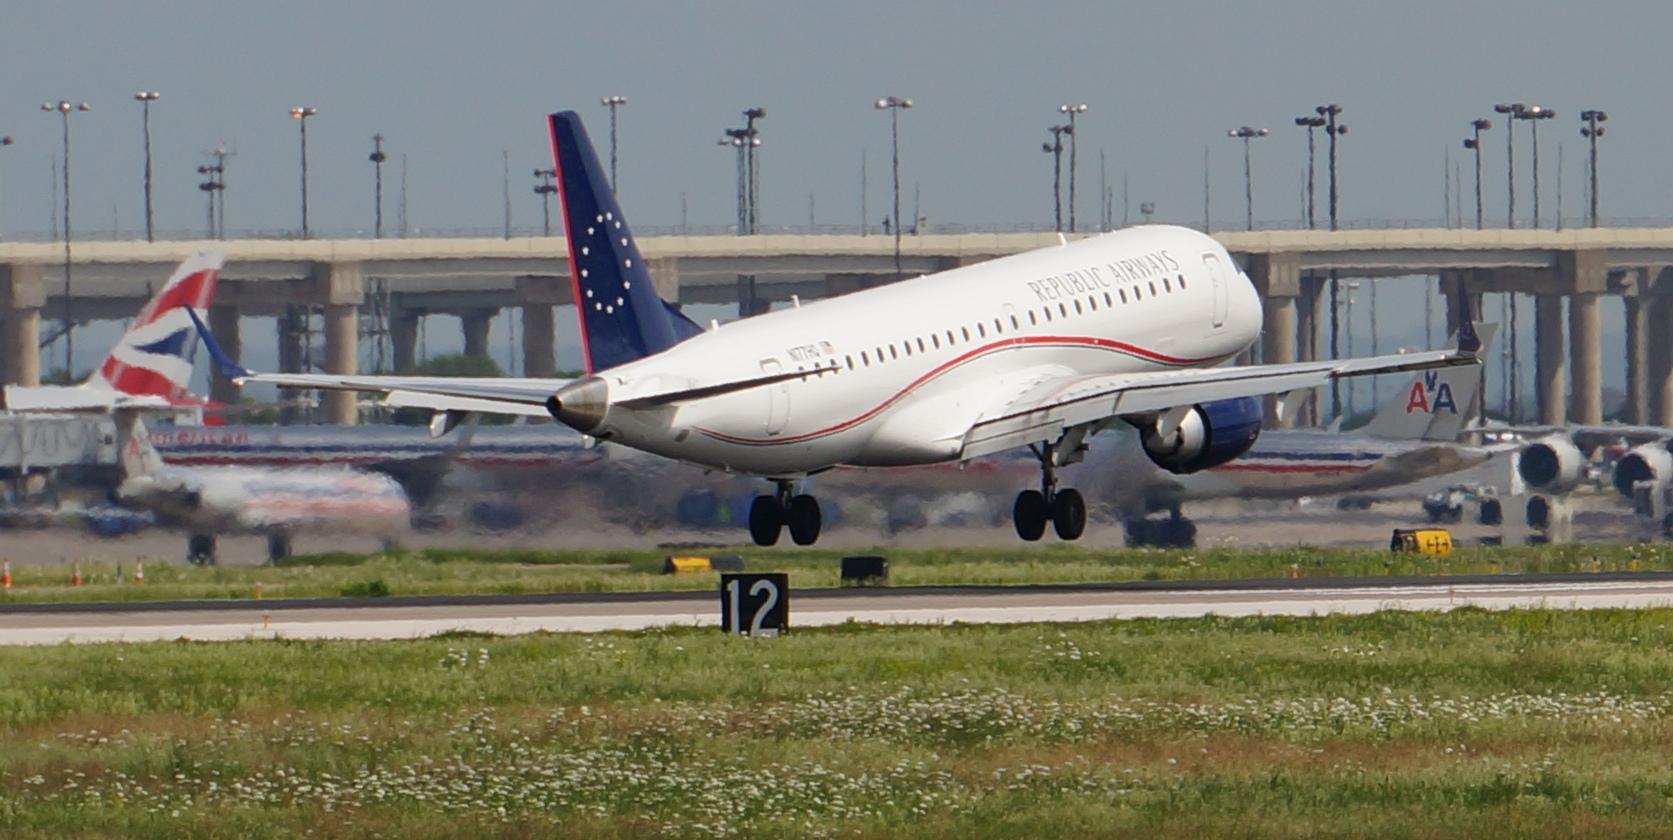 https://dallasnews.imgix.net/Republic-Airways-Embraer-ERJ-900-2011-N177HQ-landing-DFW-Airport-May-6-2015-Terry-Maxon-9.jpg